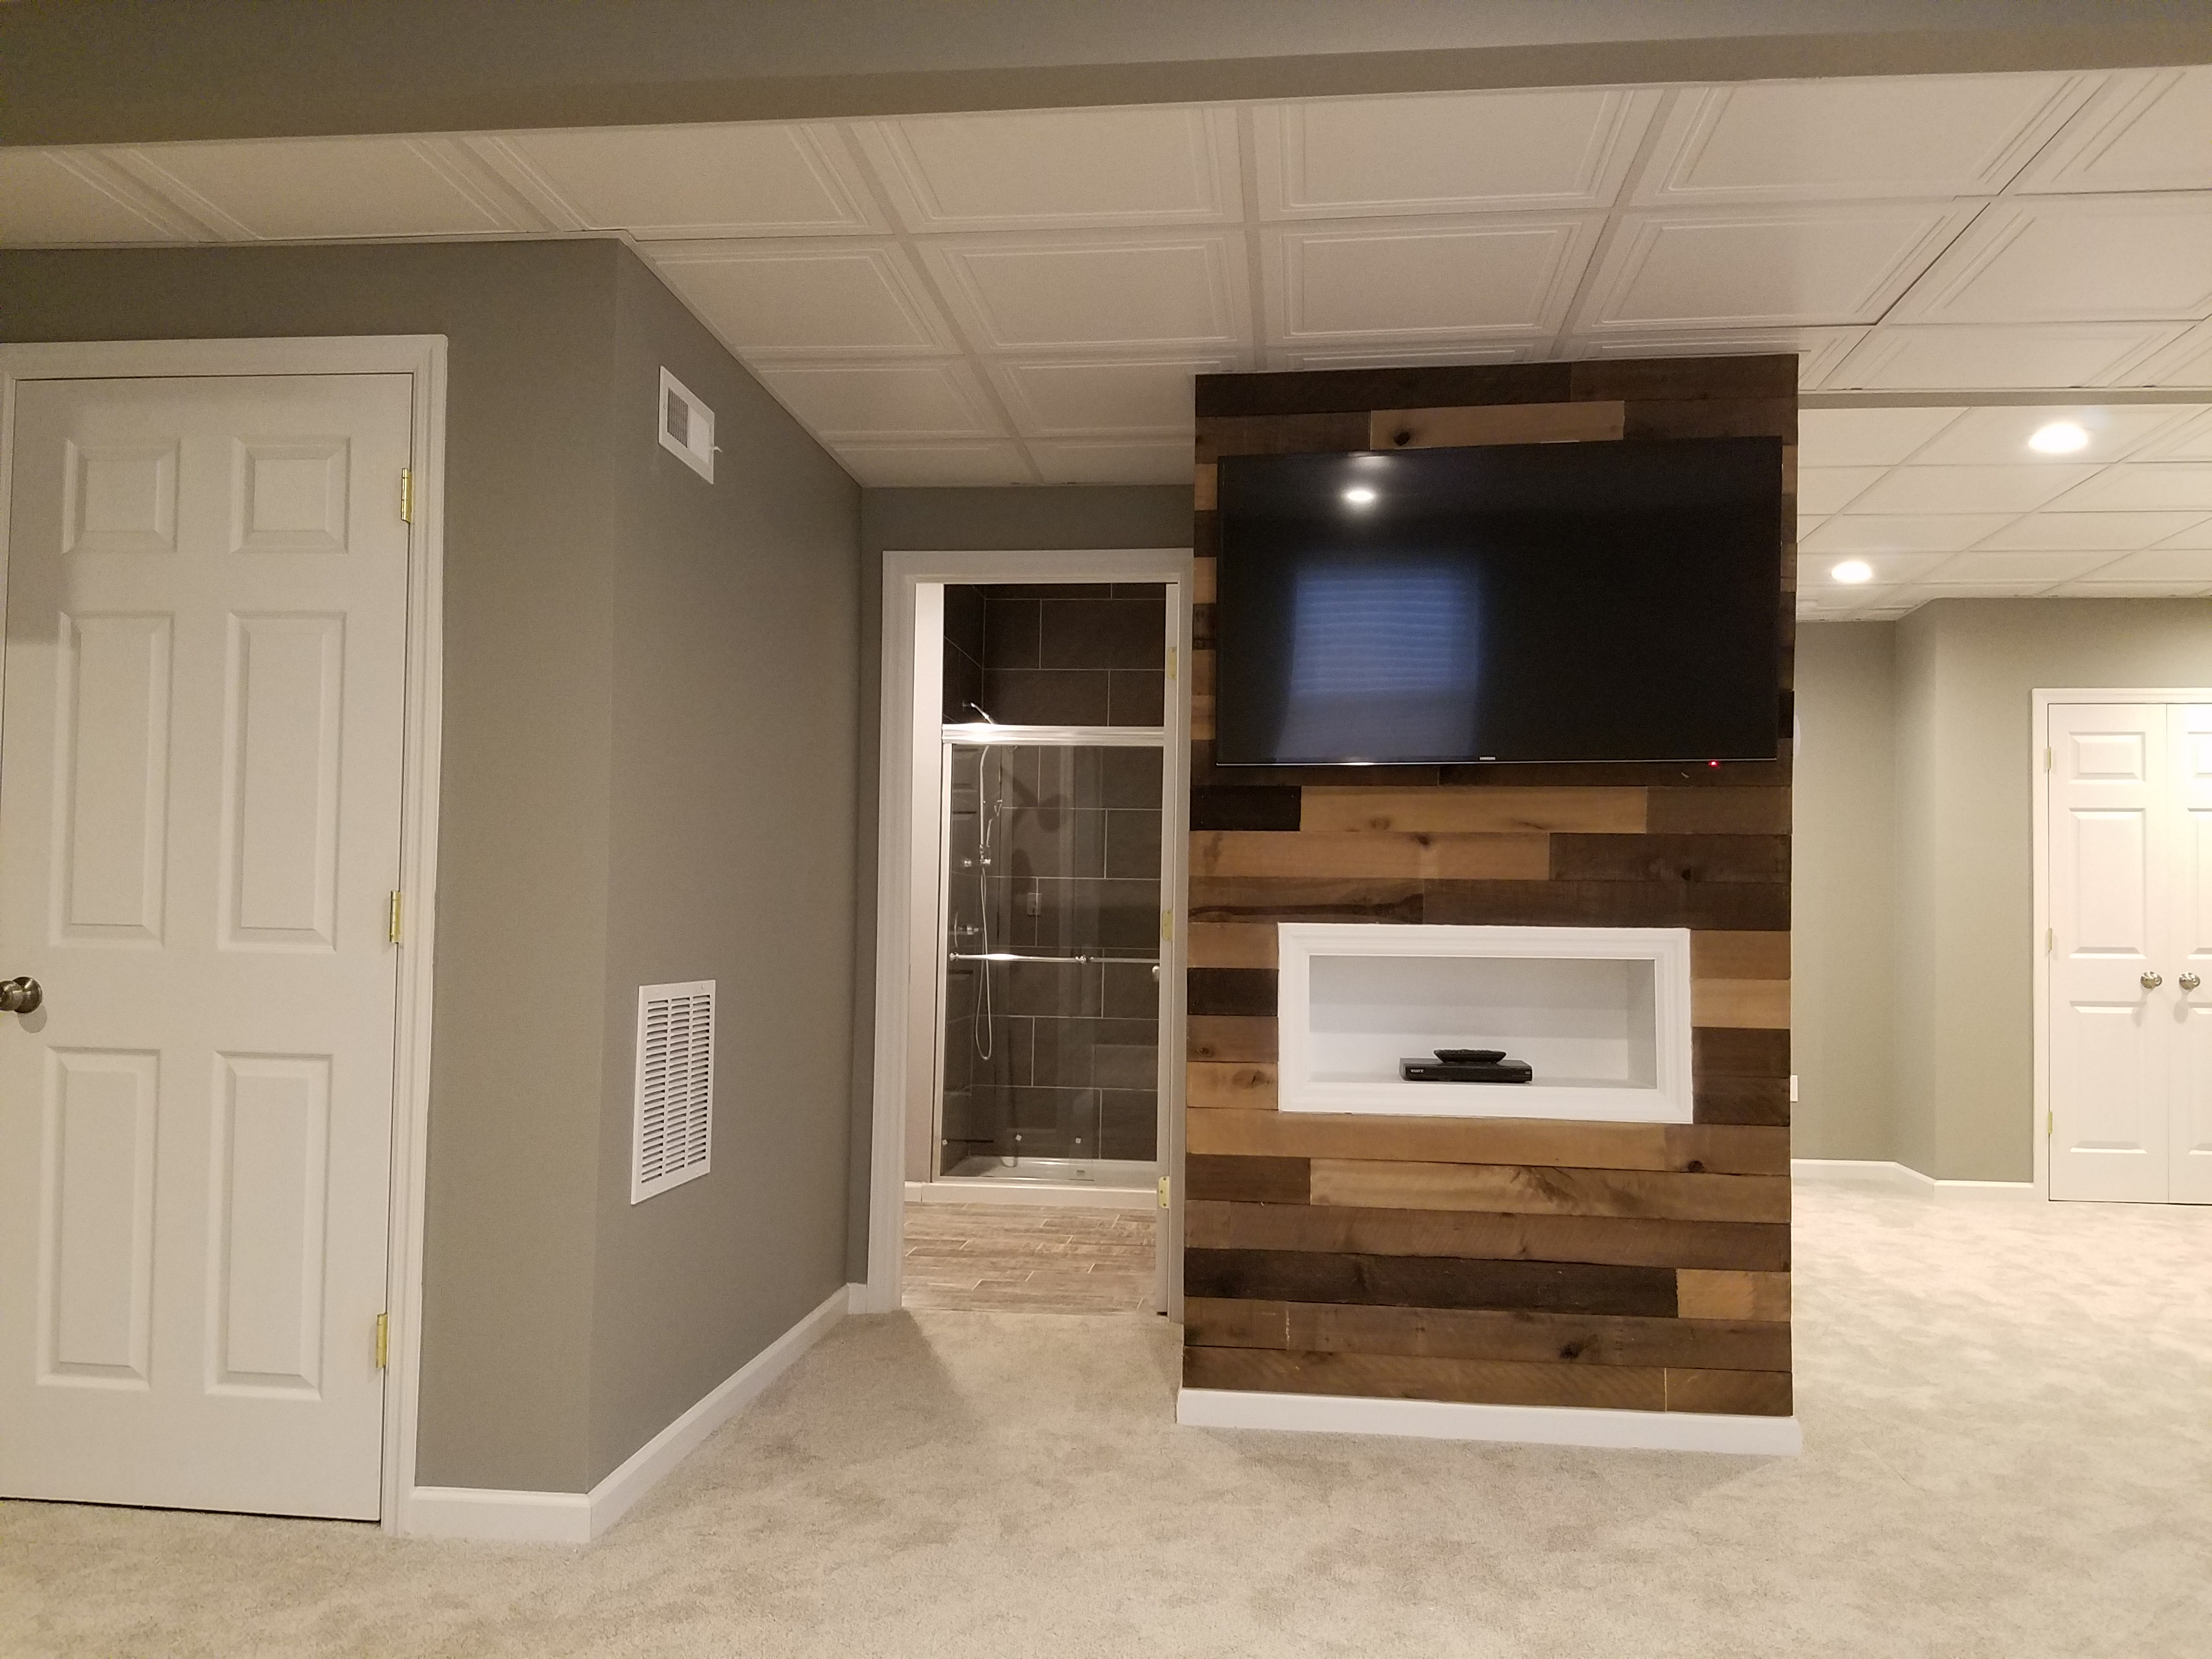 ProWorks Interiors - Goshen, NY